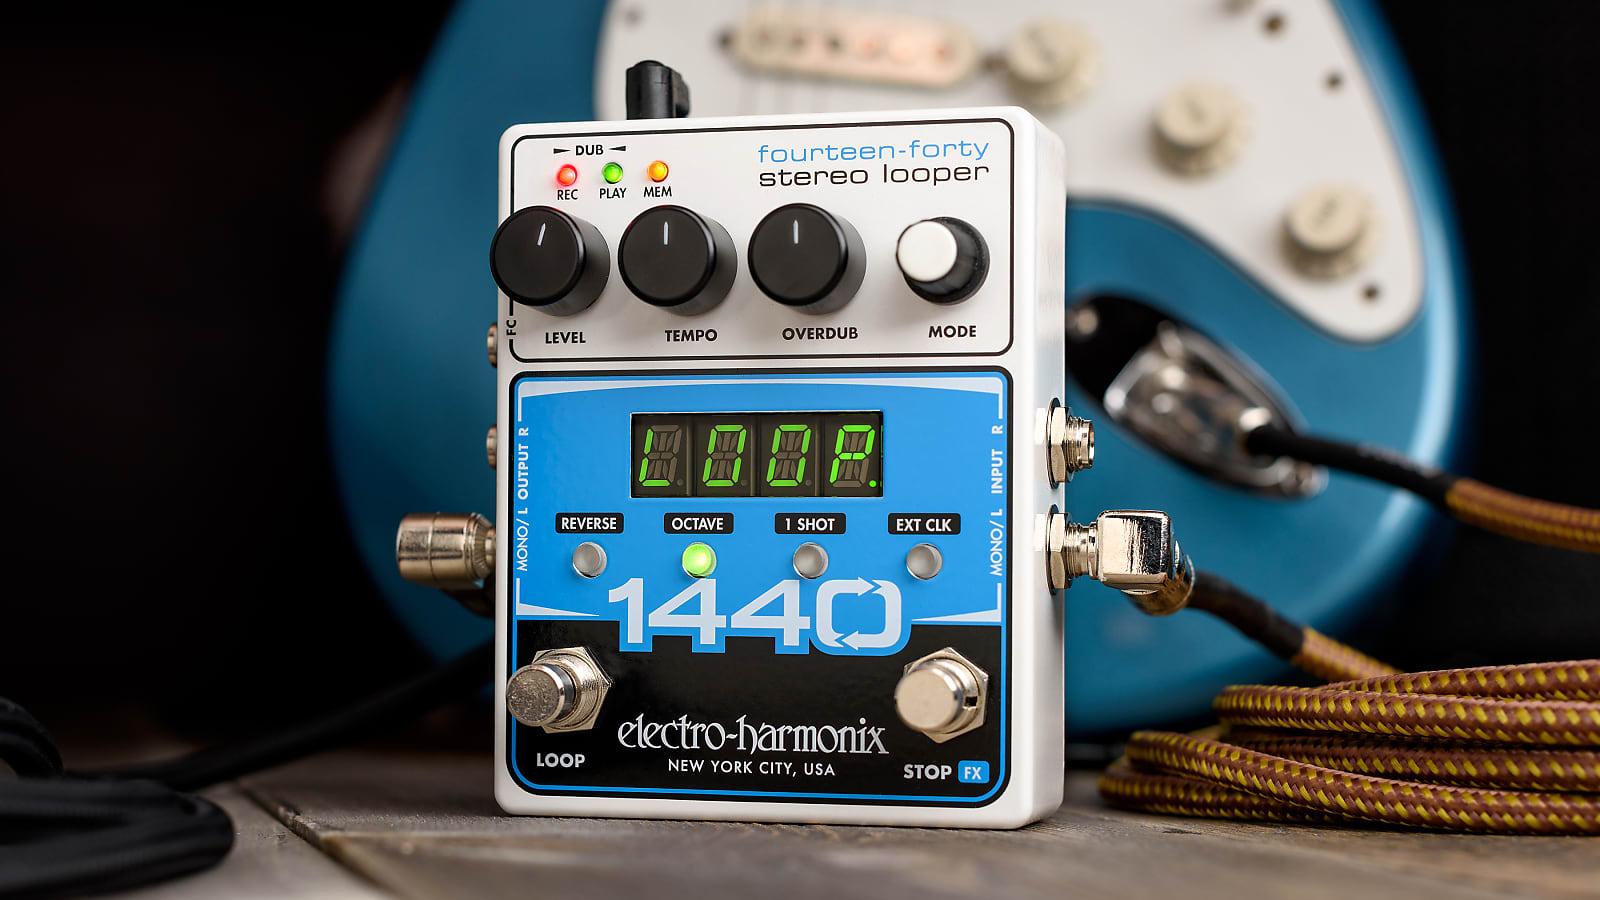 Electro-Harmonix EHX 1440 Stereo Looper Pedal